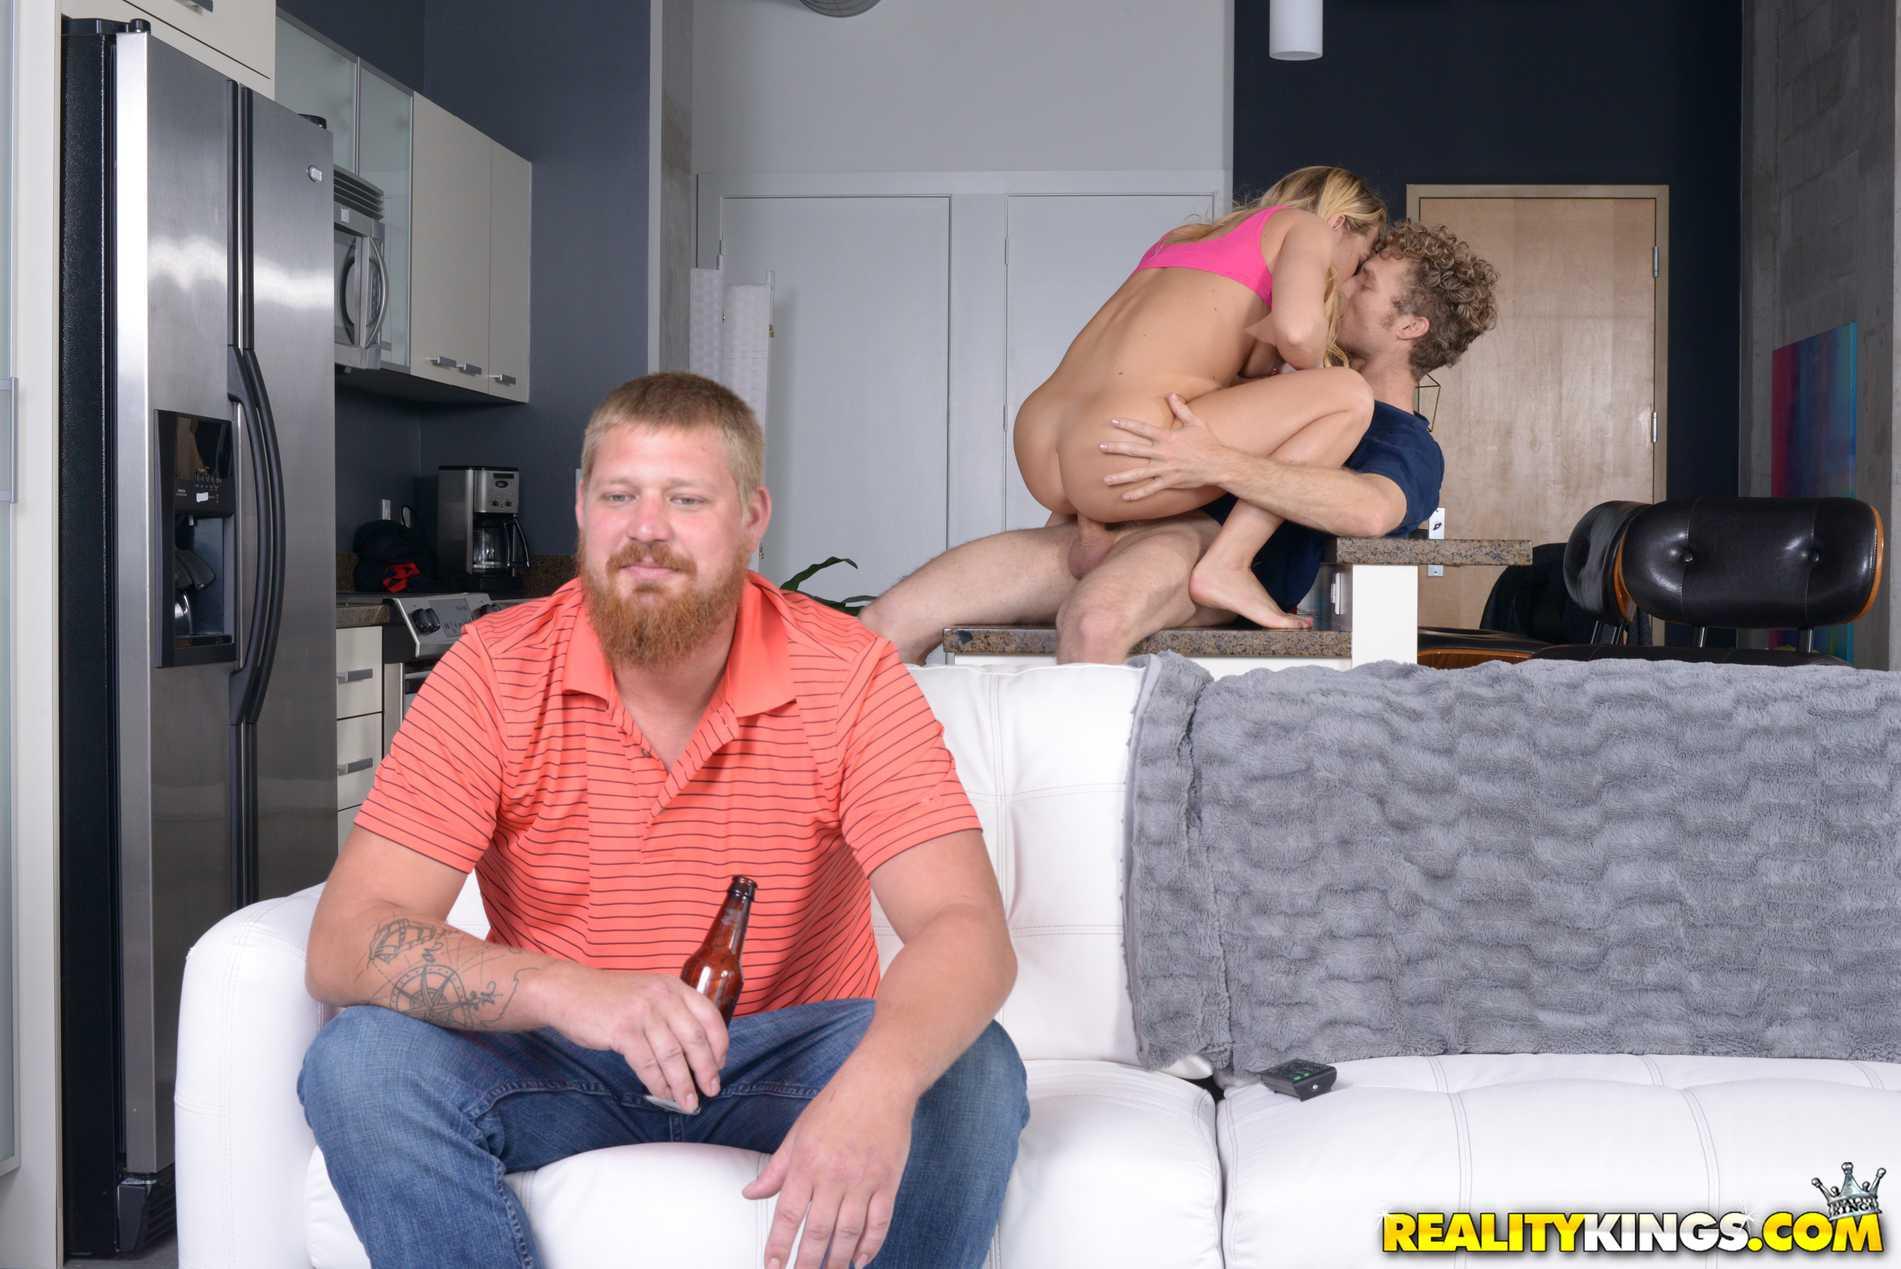 J lo pussy pics